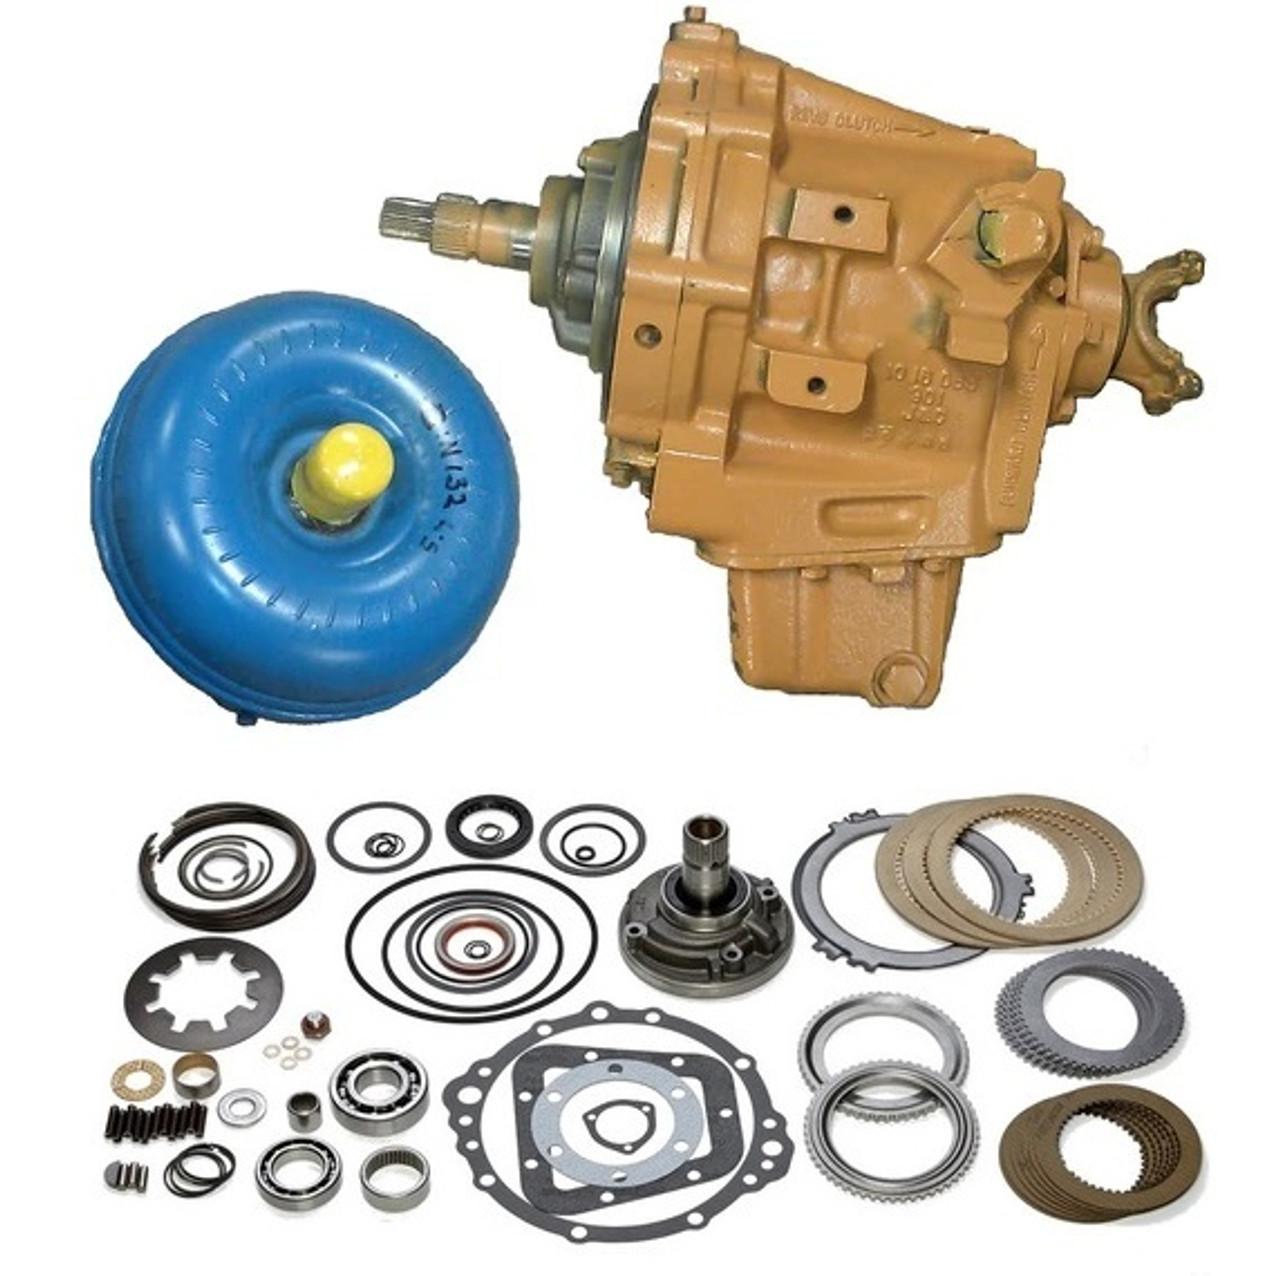 Reverser and Reverser Parts